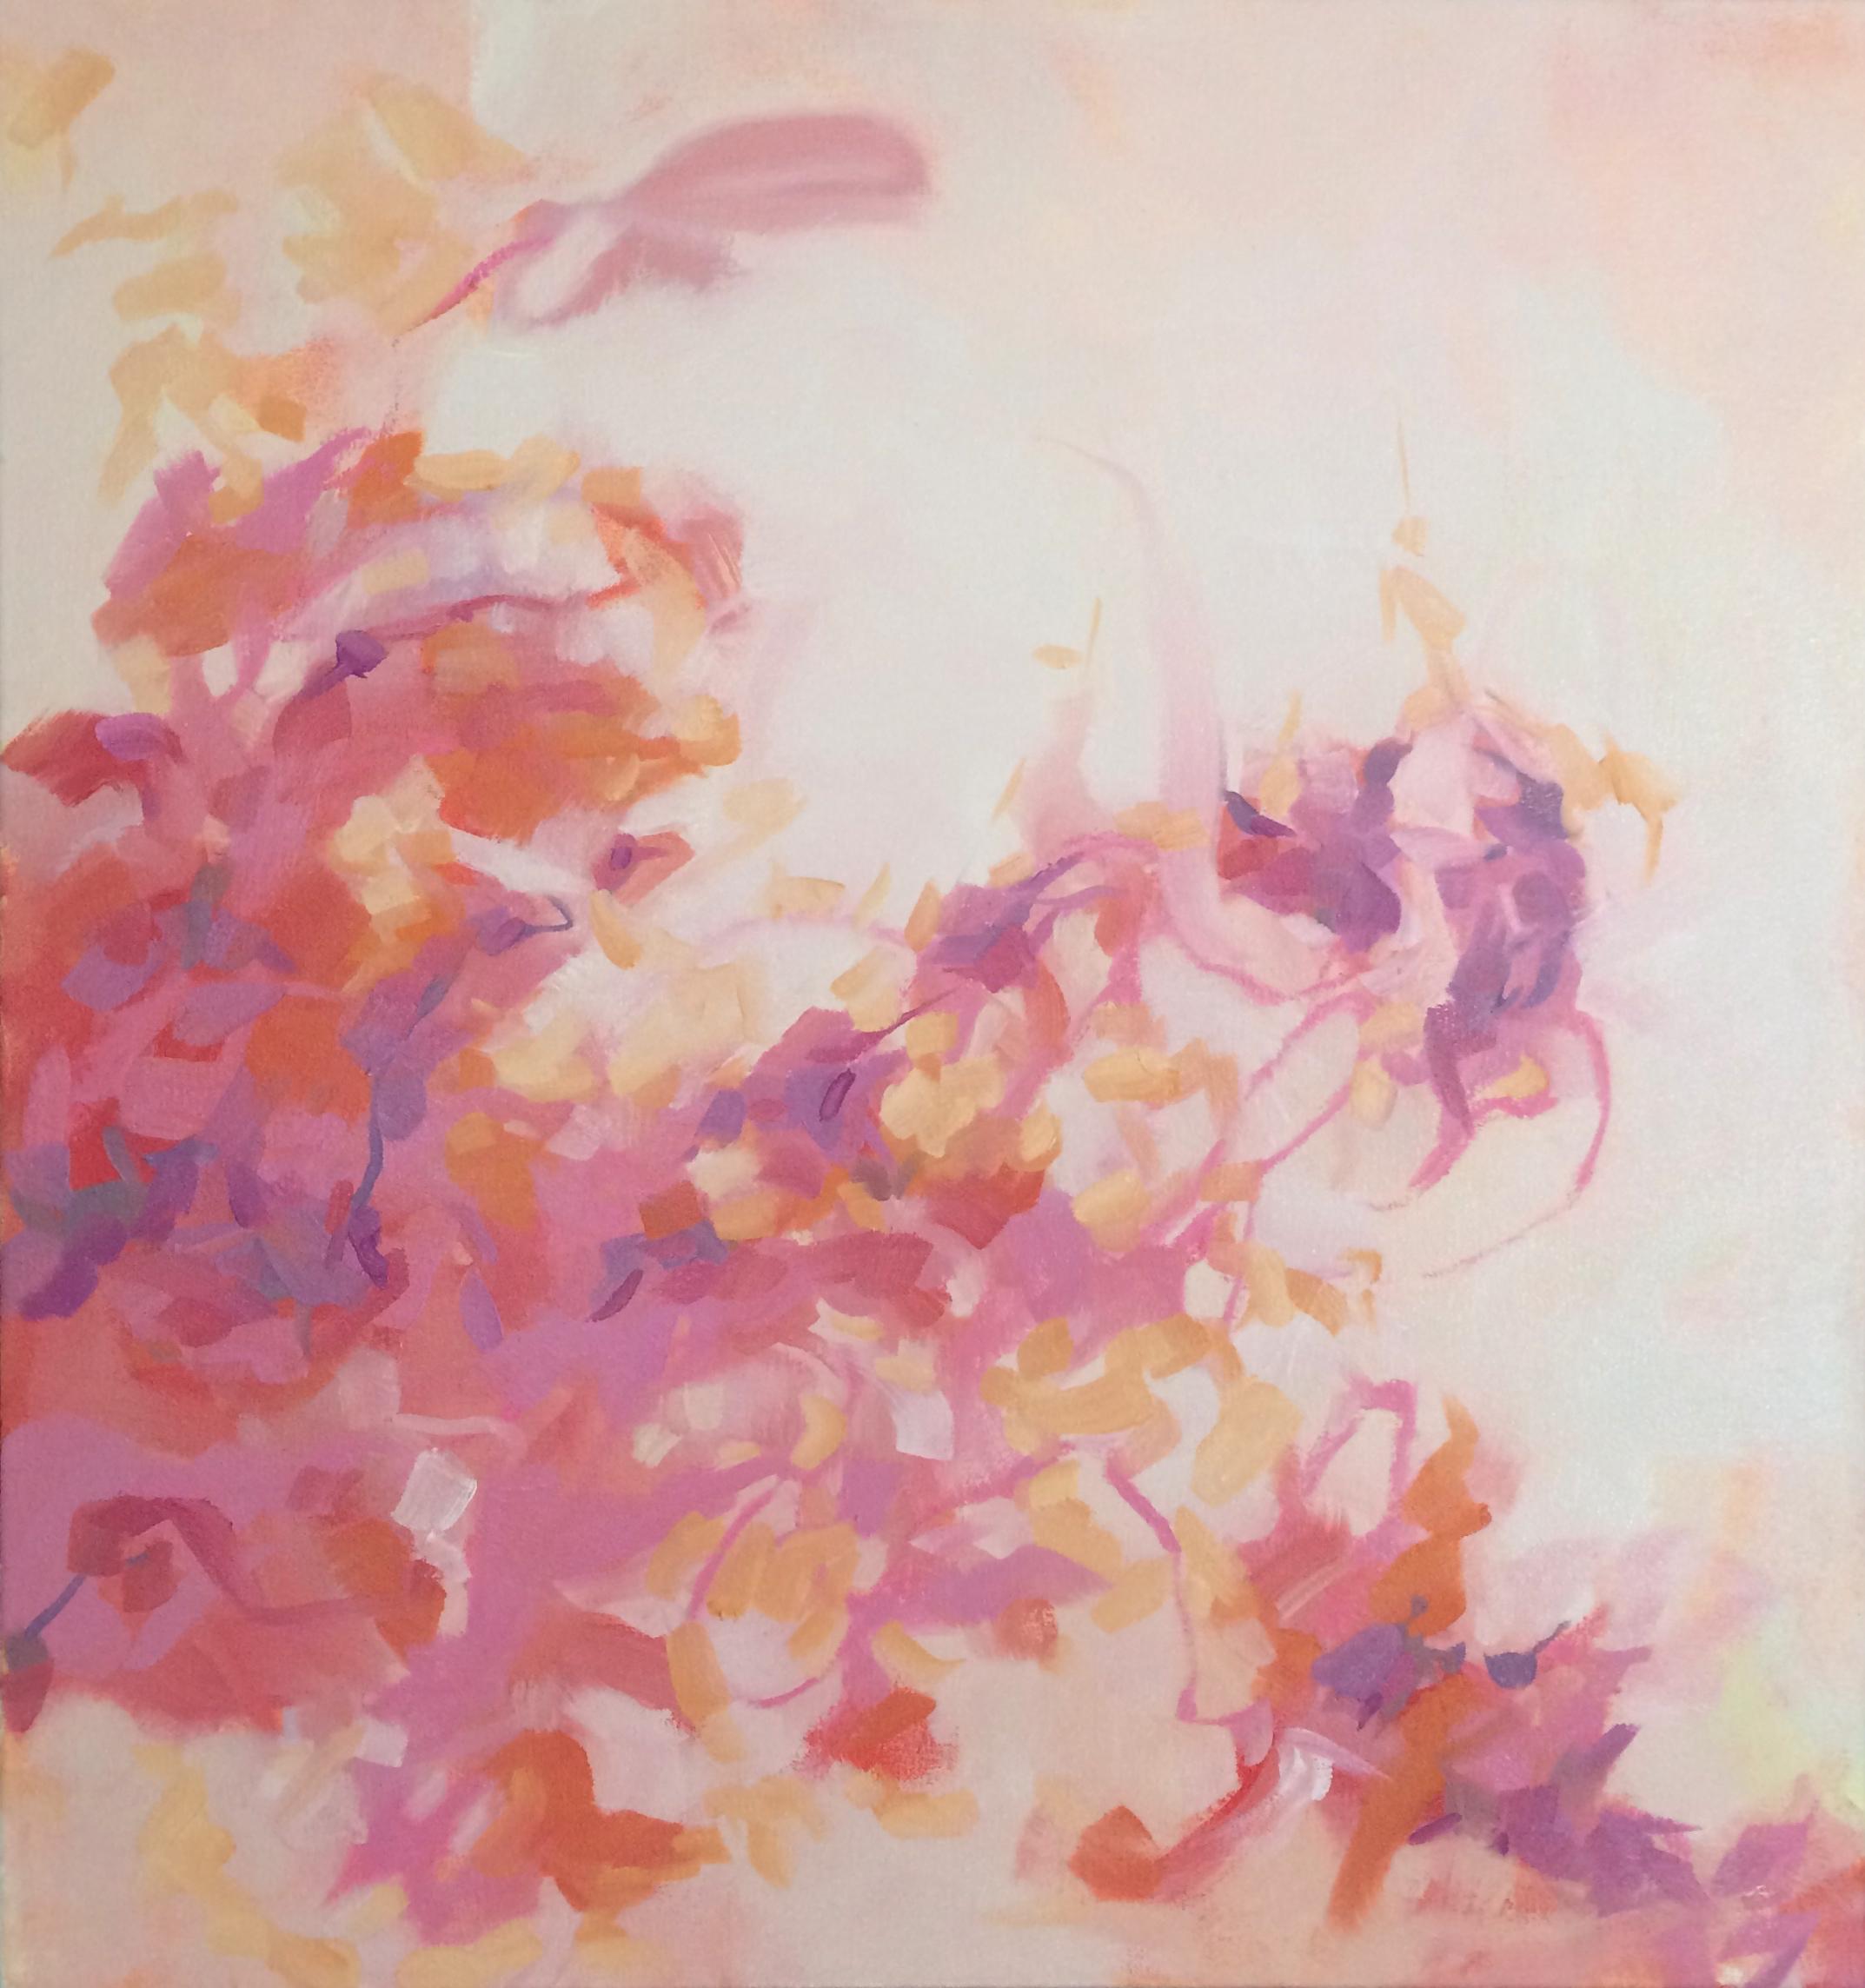 Schmitz_Delicate Balance II_oil on canvas_32x30_1700.jpg